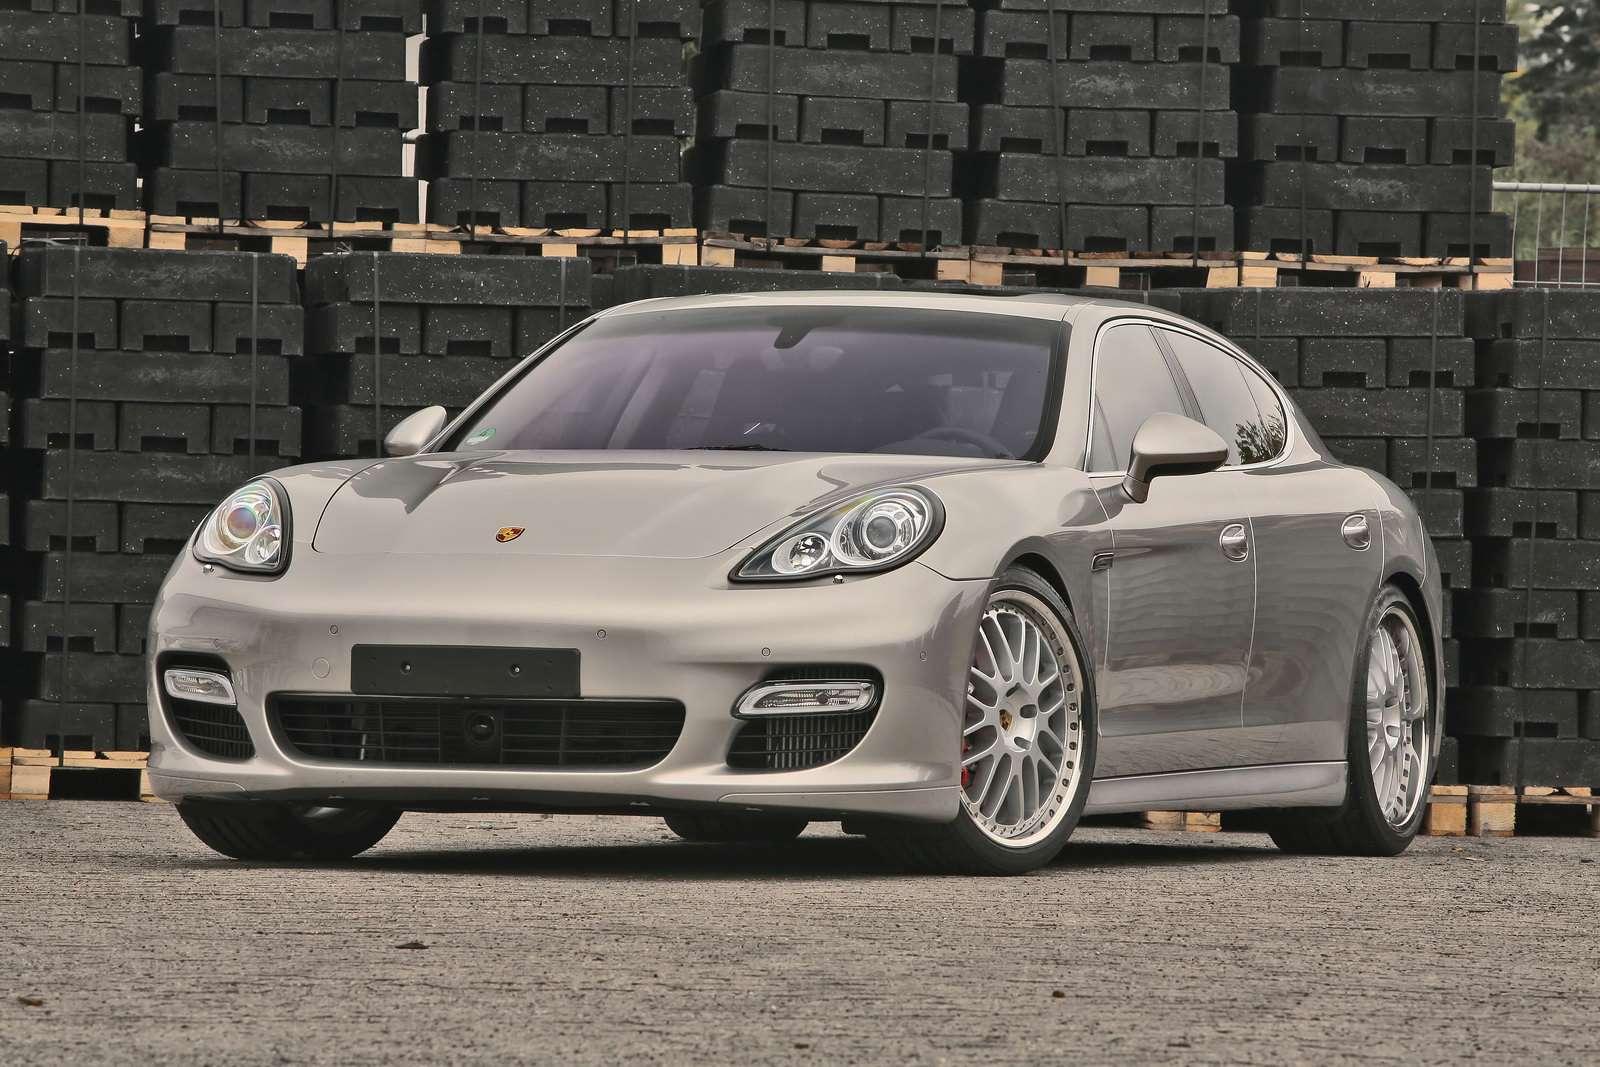 Porsche Panamera od Mcchip 2009